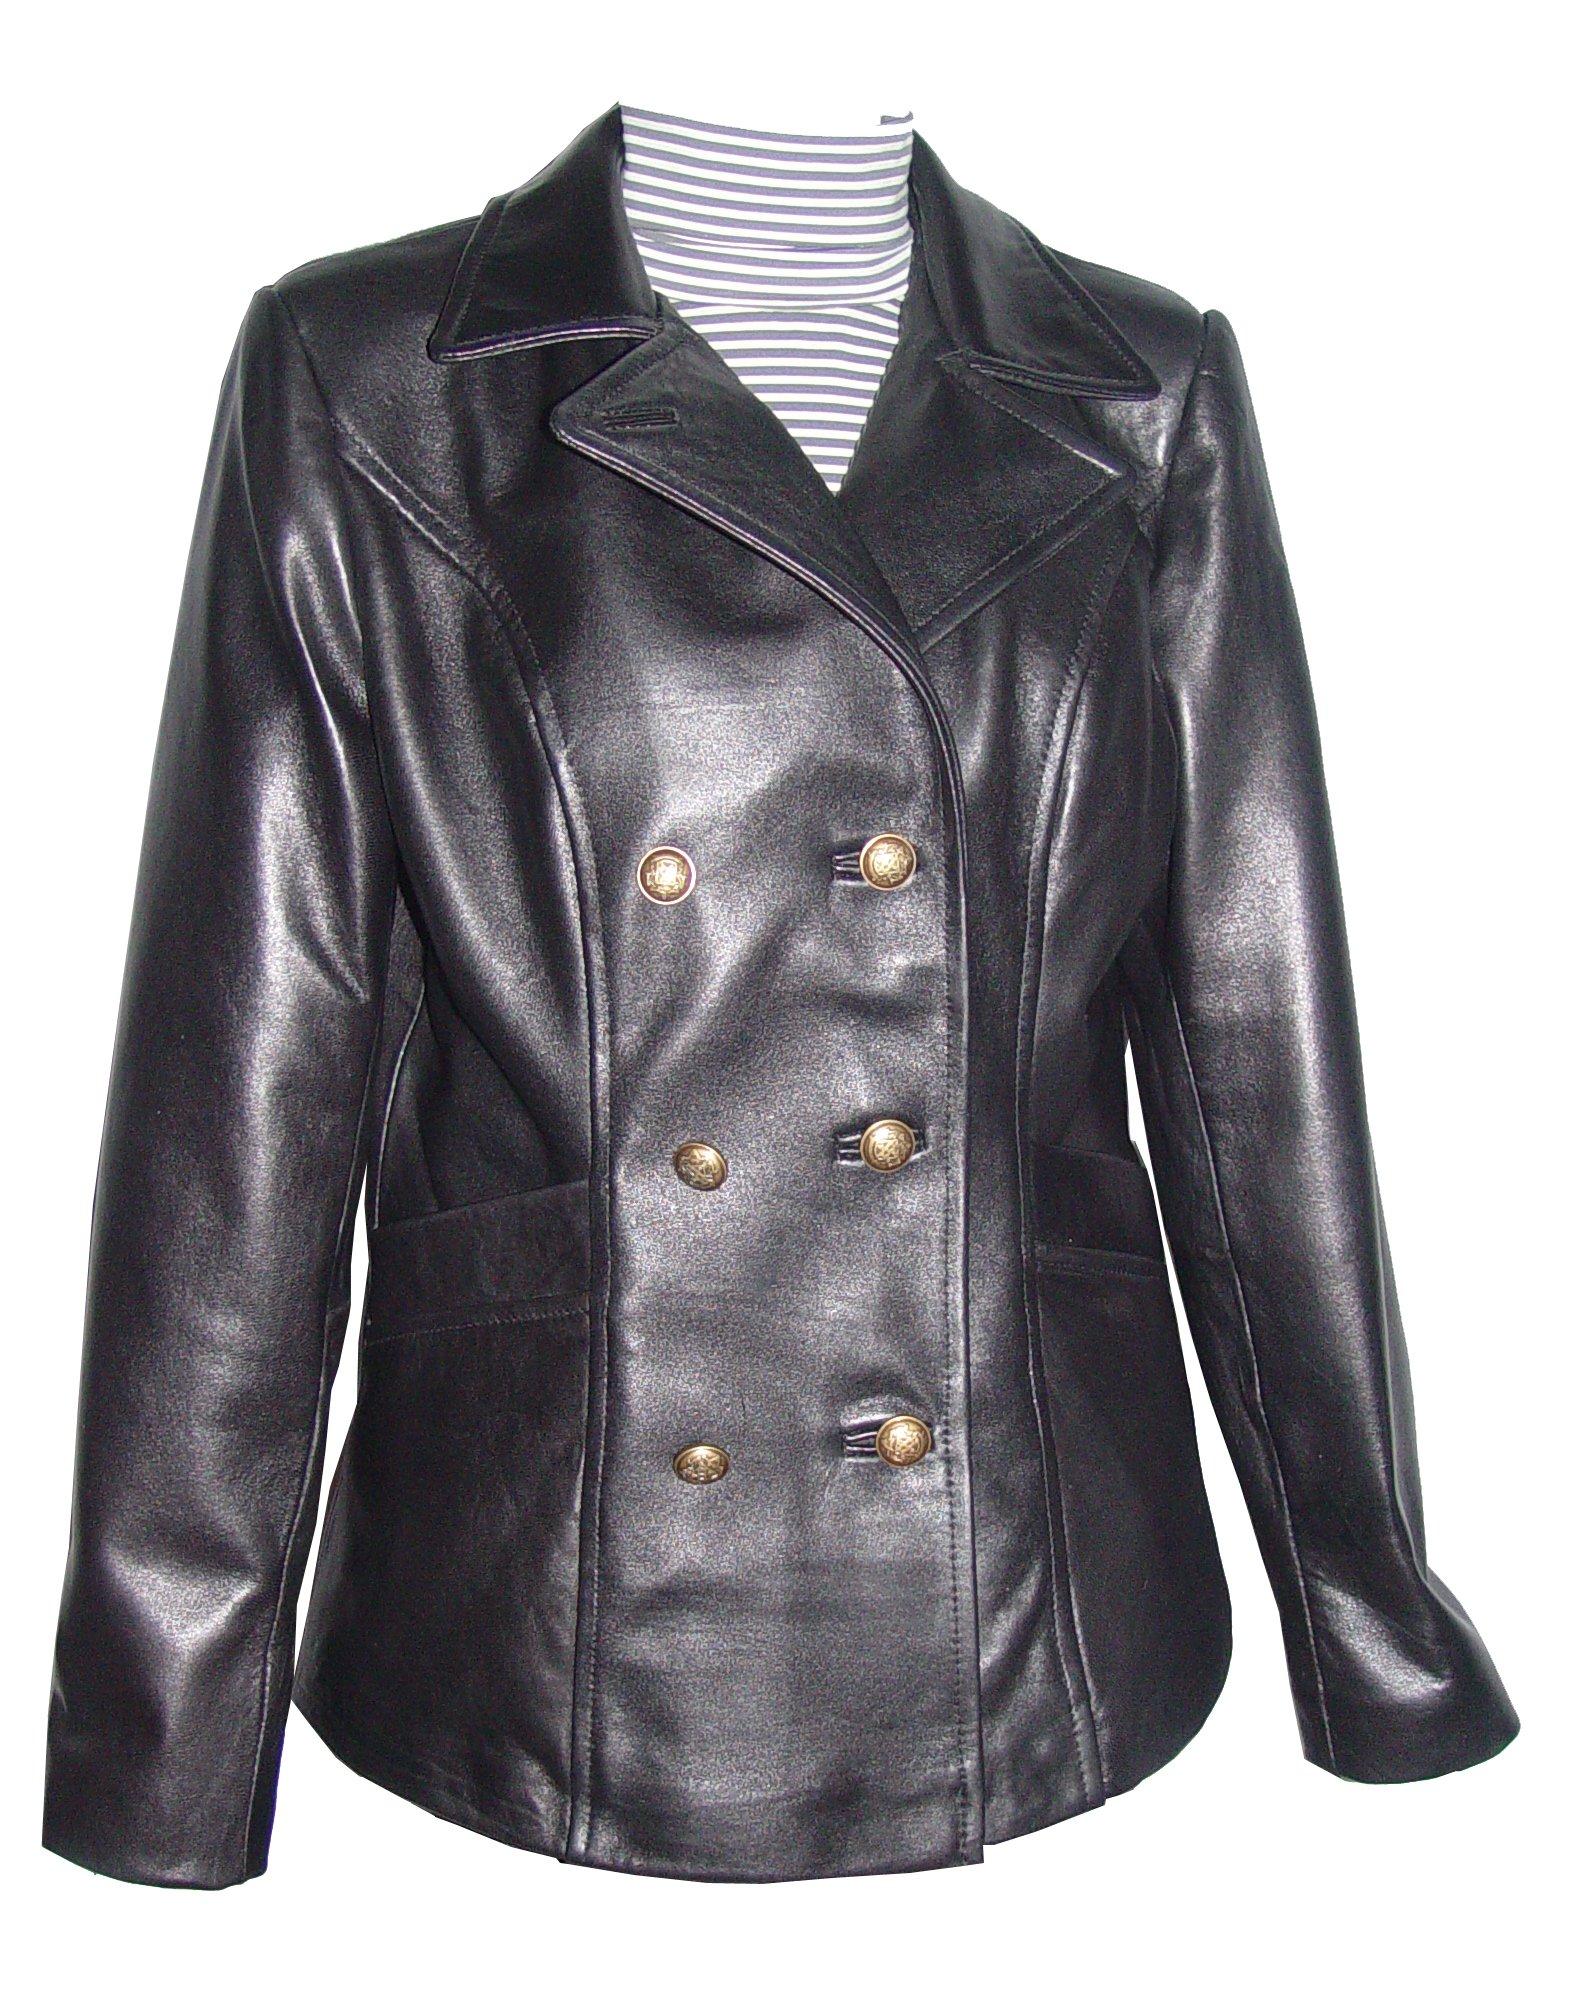 Nettailor Women PETITE & ALL SIZE Fashion 4101db Basic Lamb Leather Long Blazer